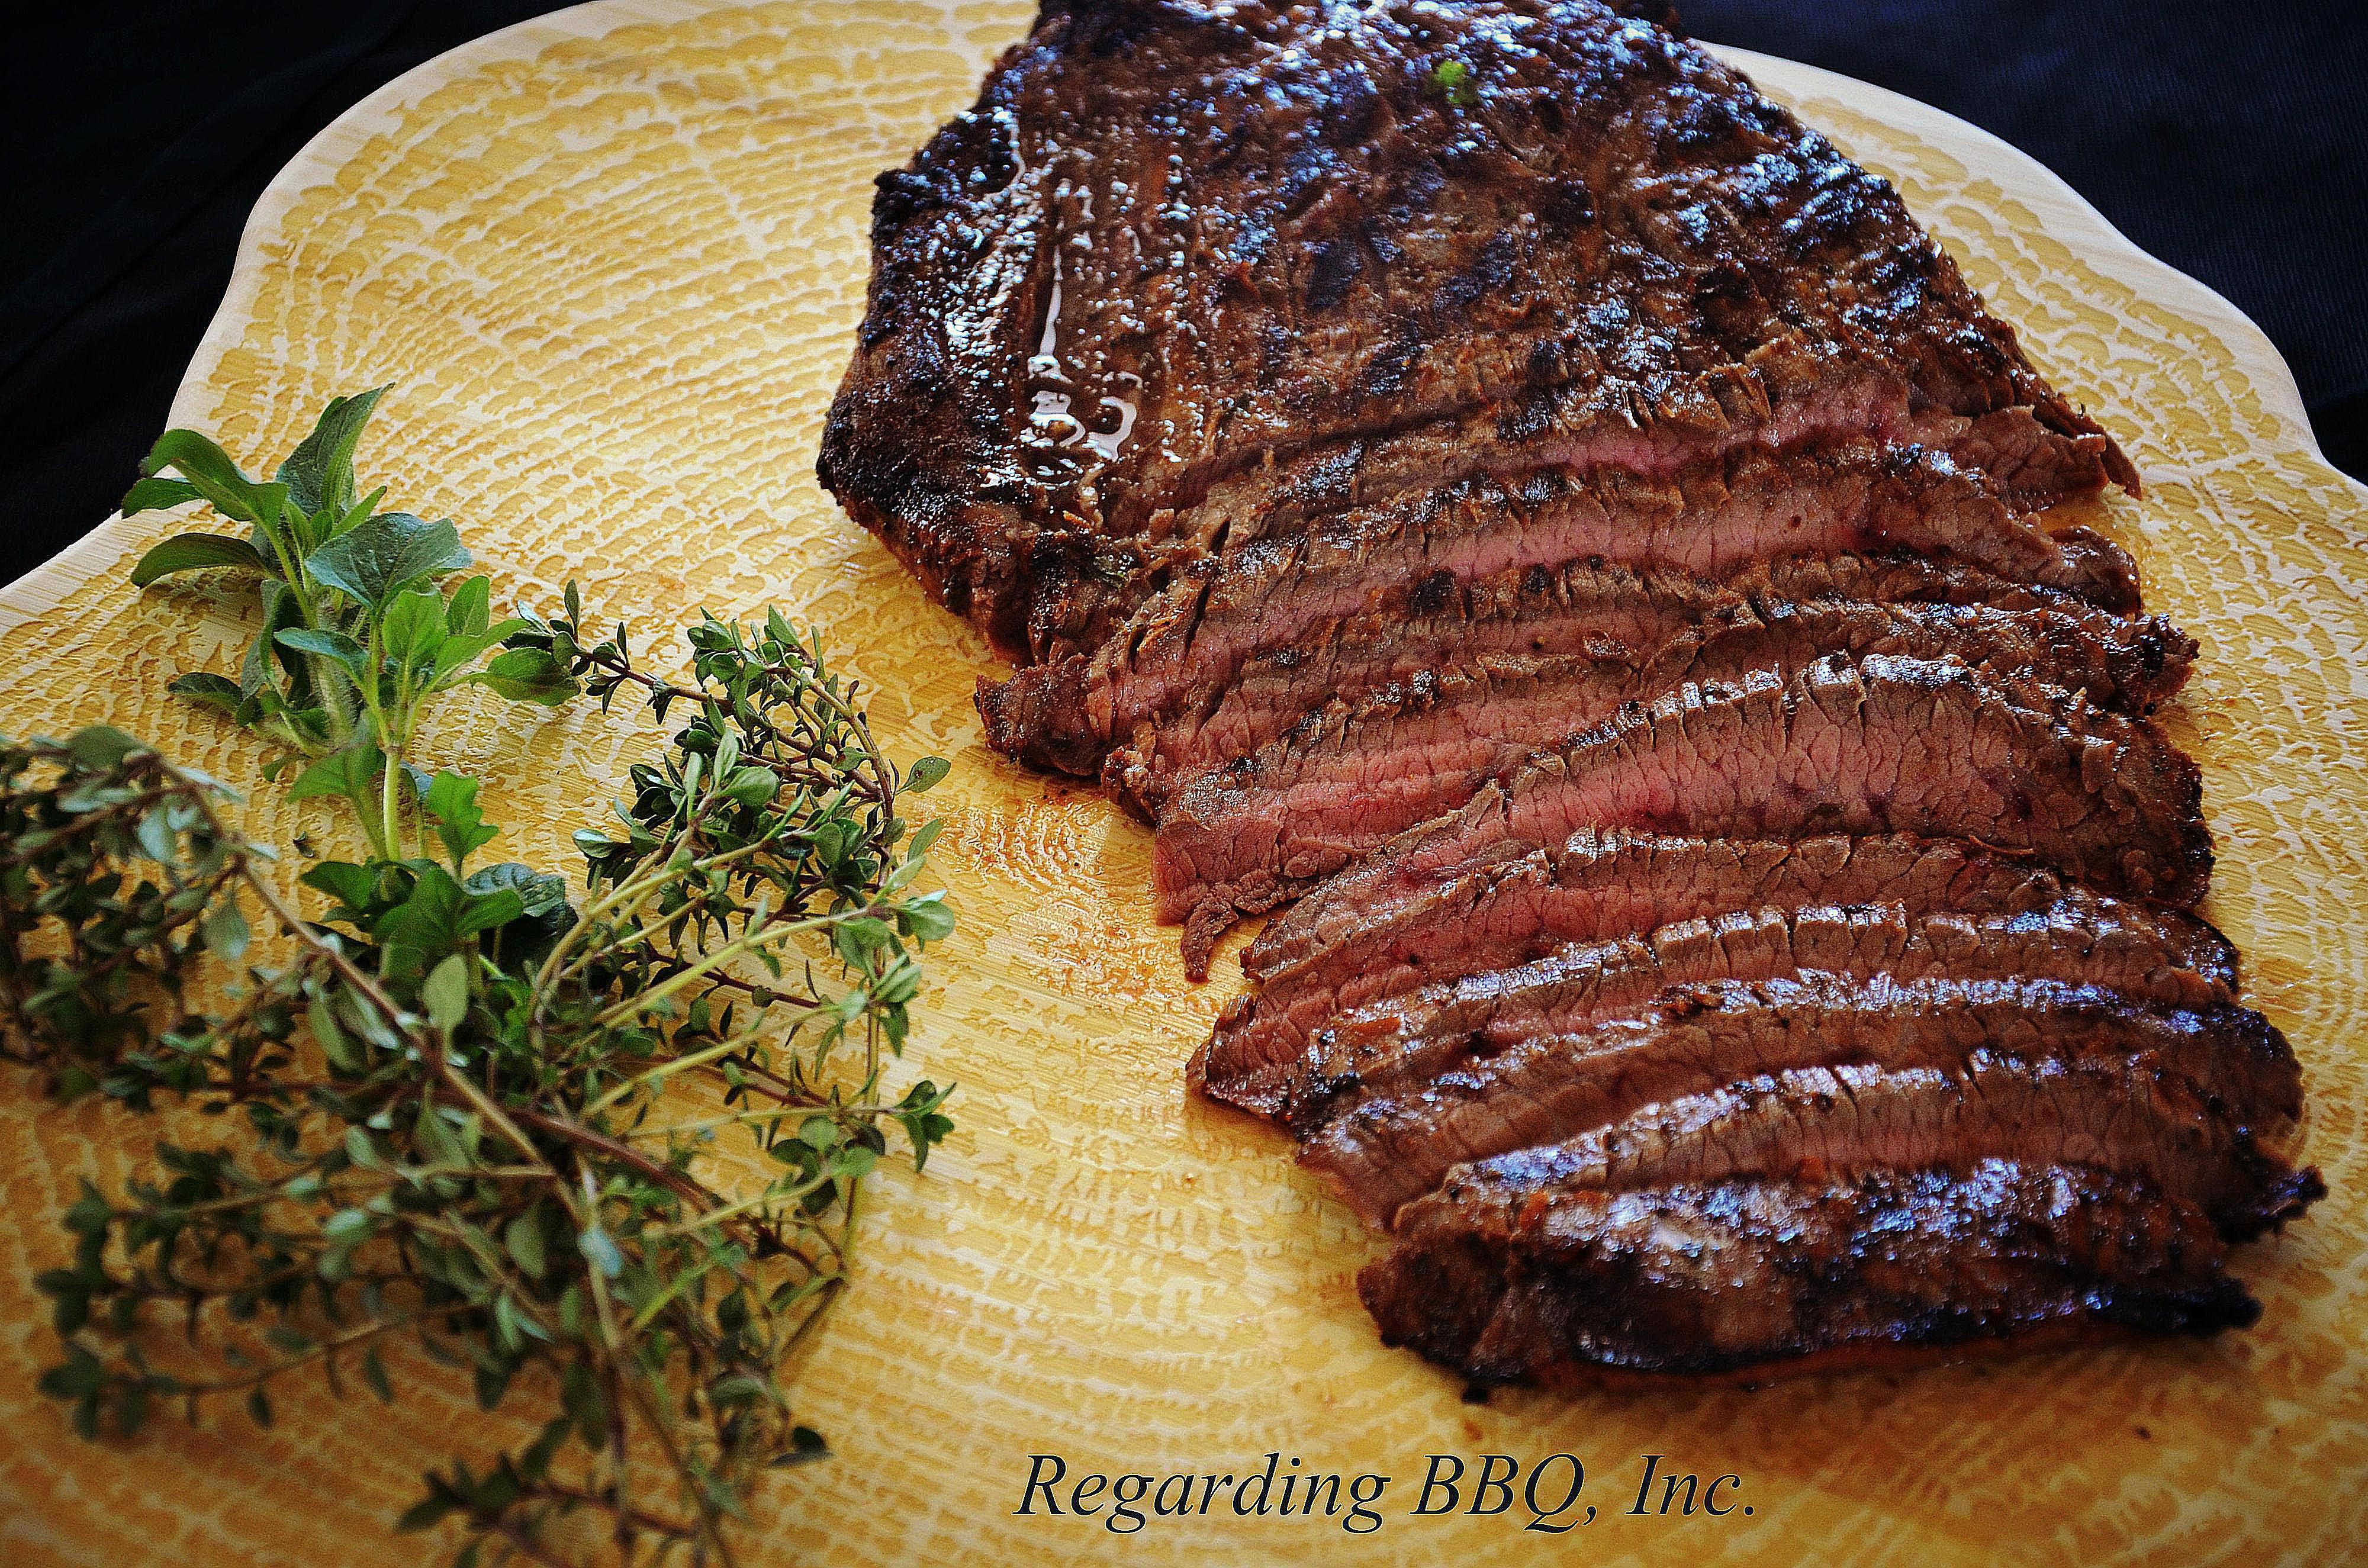 How To Make Teriyaki Steak At Home